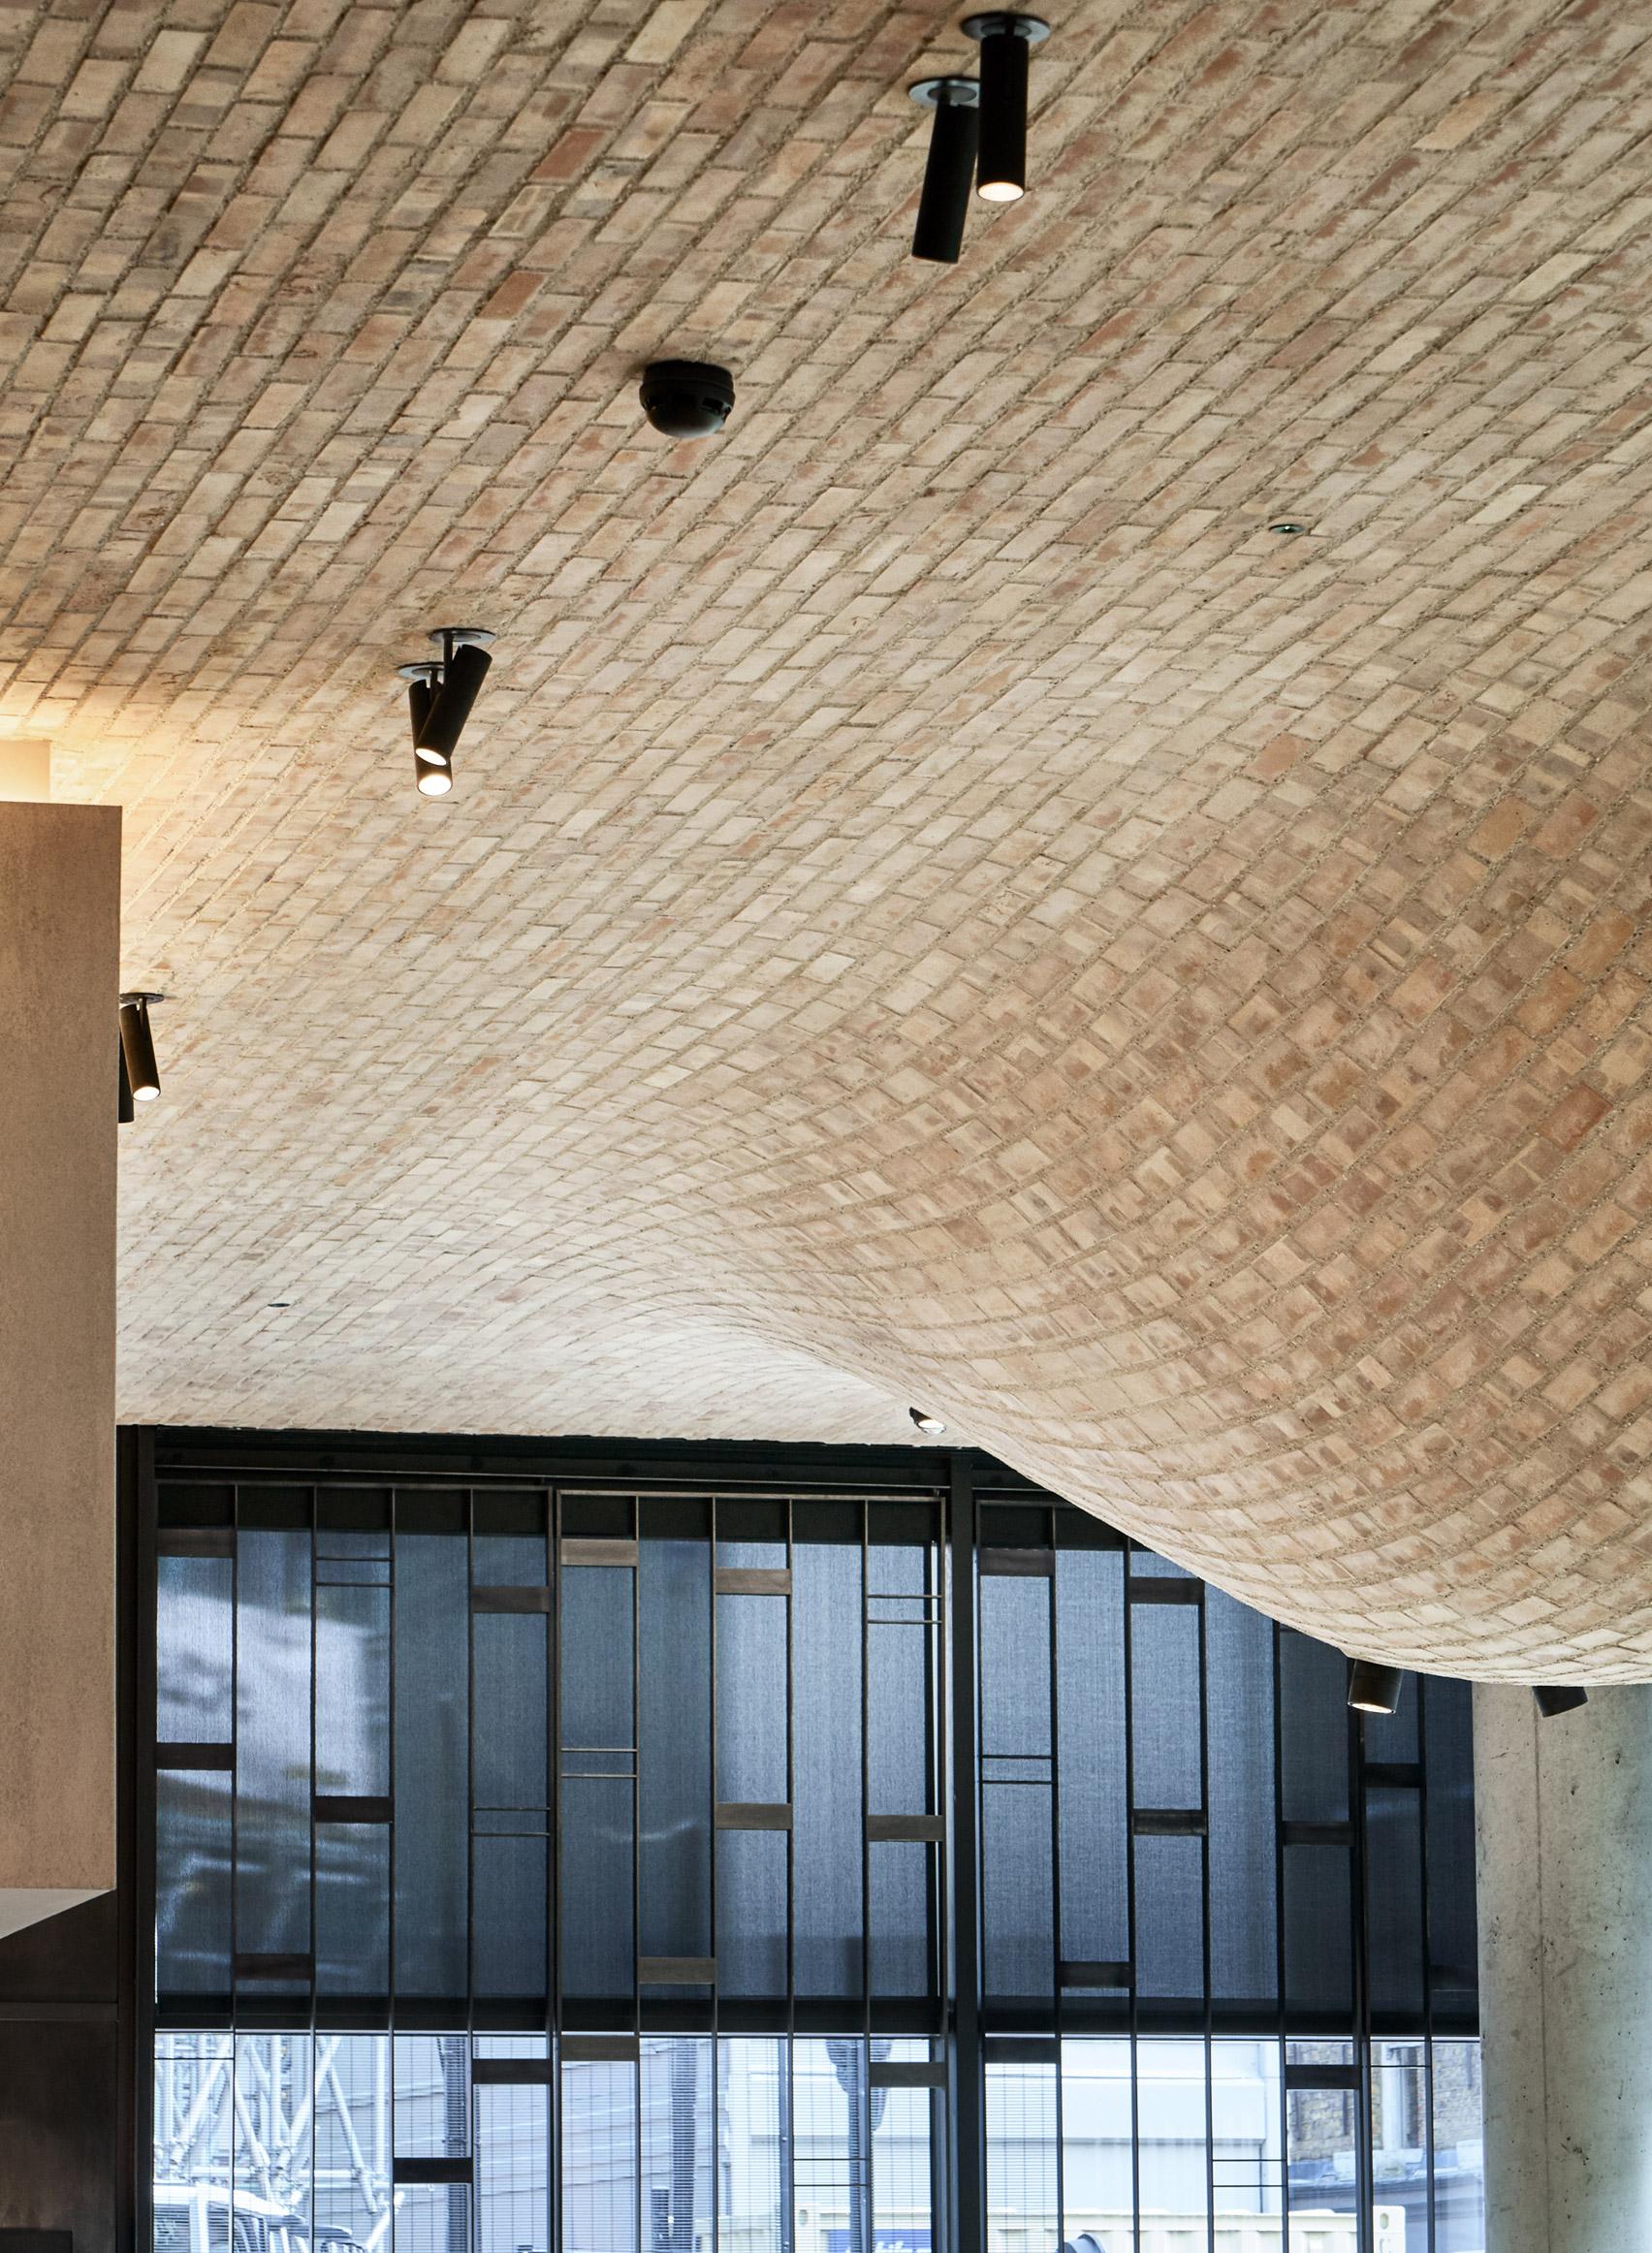 fucina-restaurant-andy-martin-architecture-interiors-london_dezeen_1704_col_7